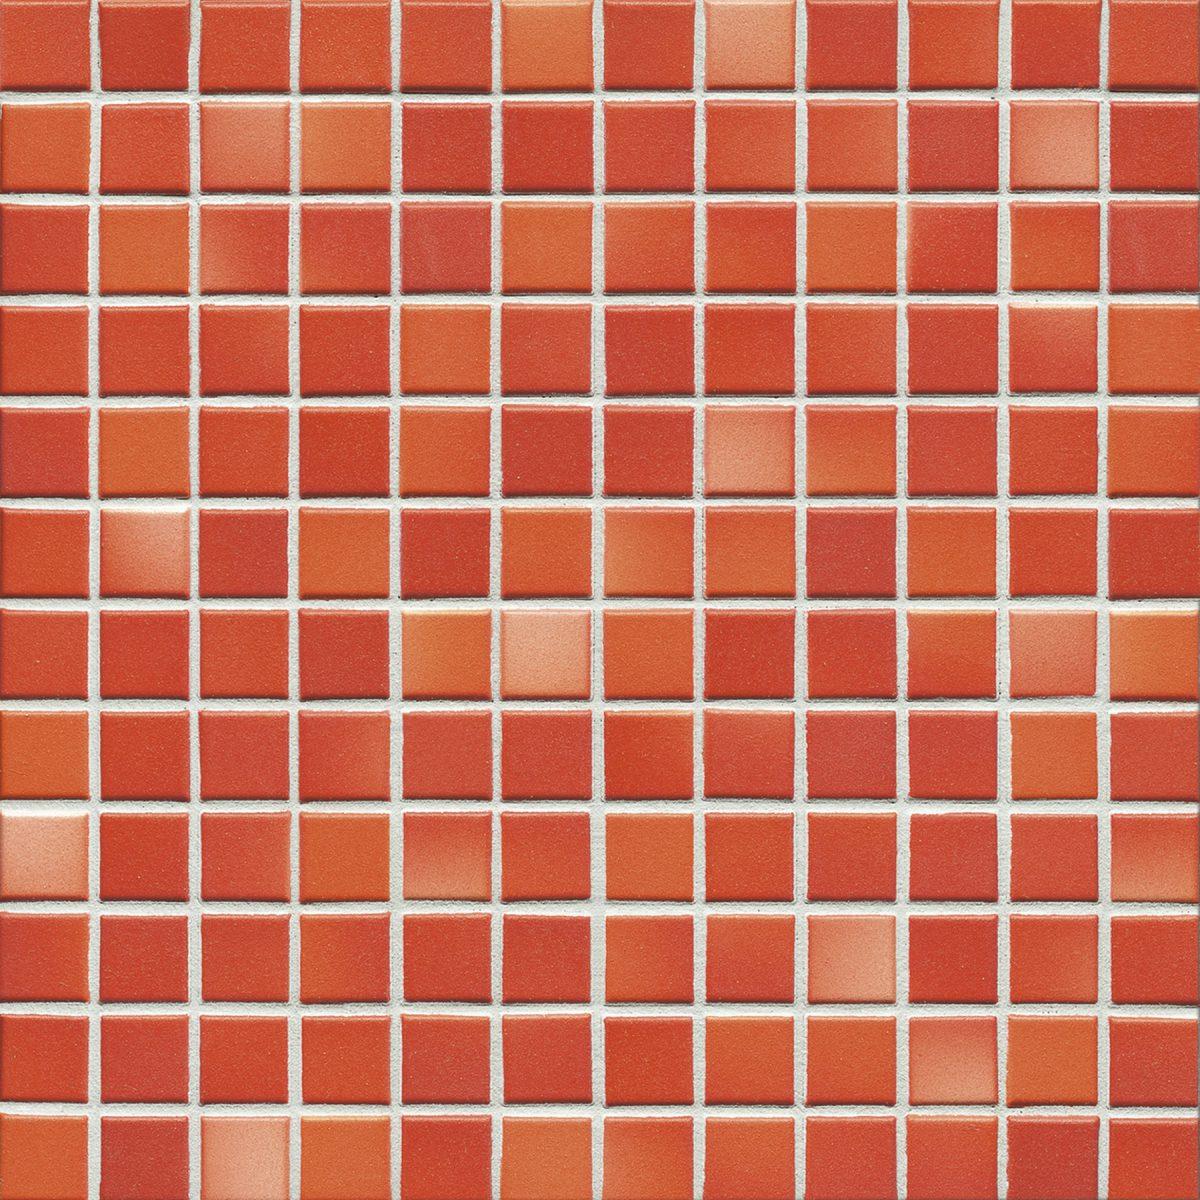 Мозаика серия Fresh 2,4 X 2,4 см Coral Red Mix Secura (противоскользящая R10/B)